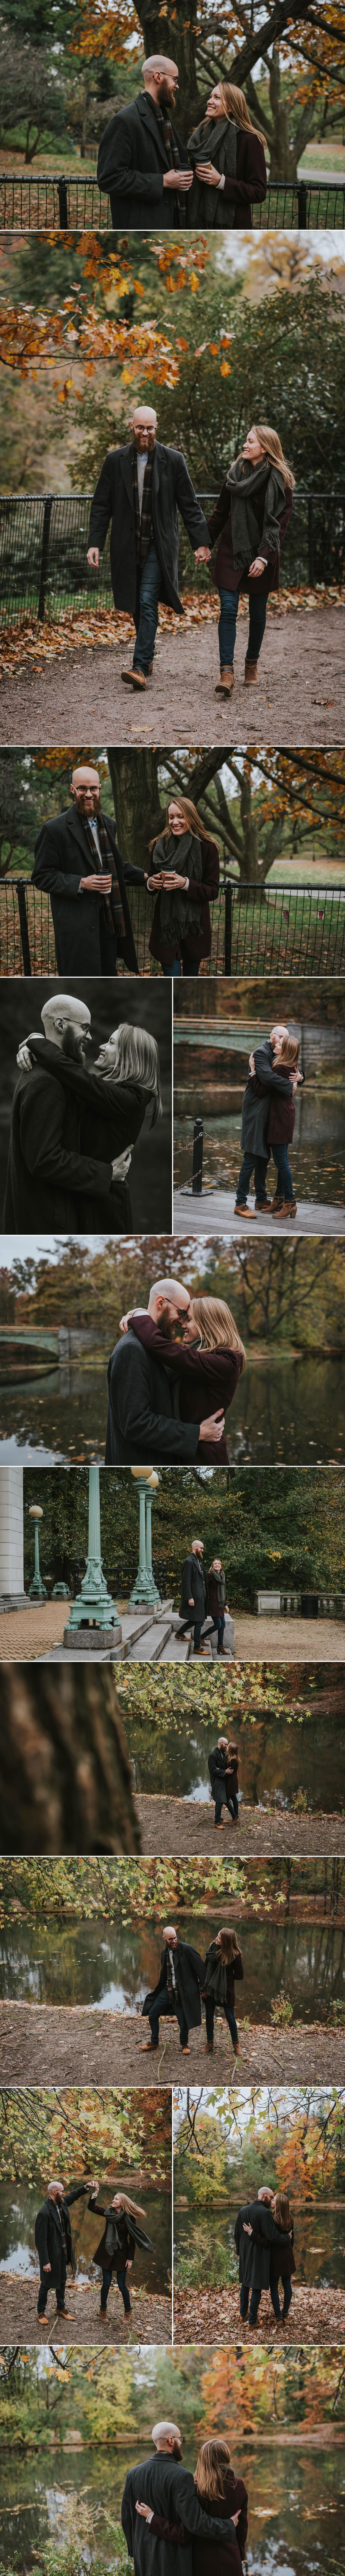 Brad & Lindsay Prospect Park Engagement Brooklyn NYC (1).jpg